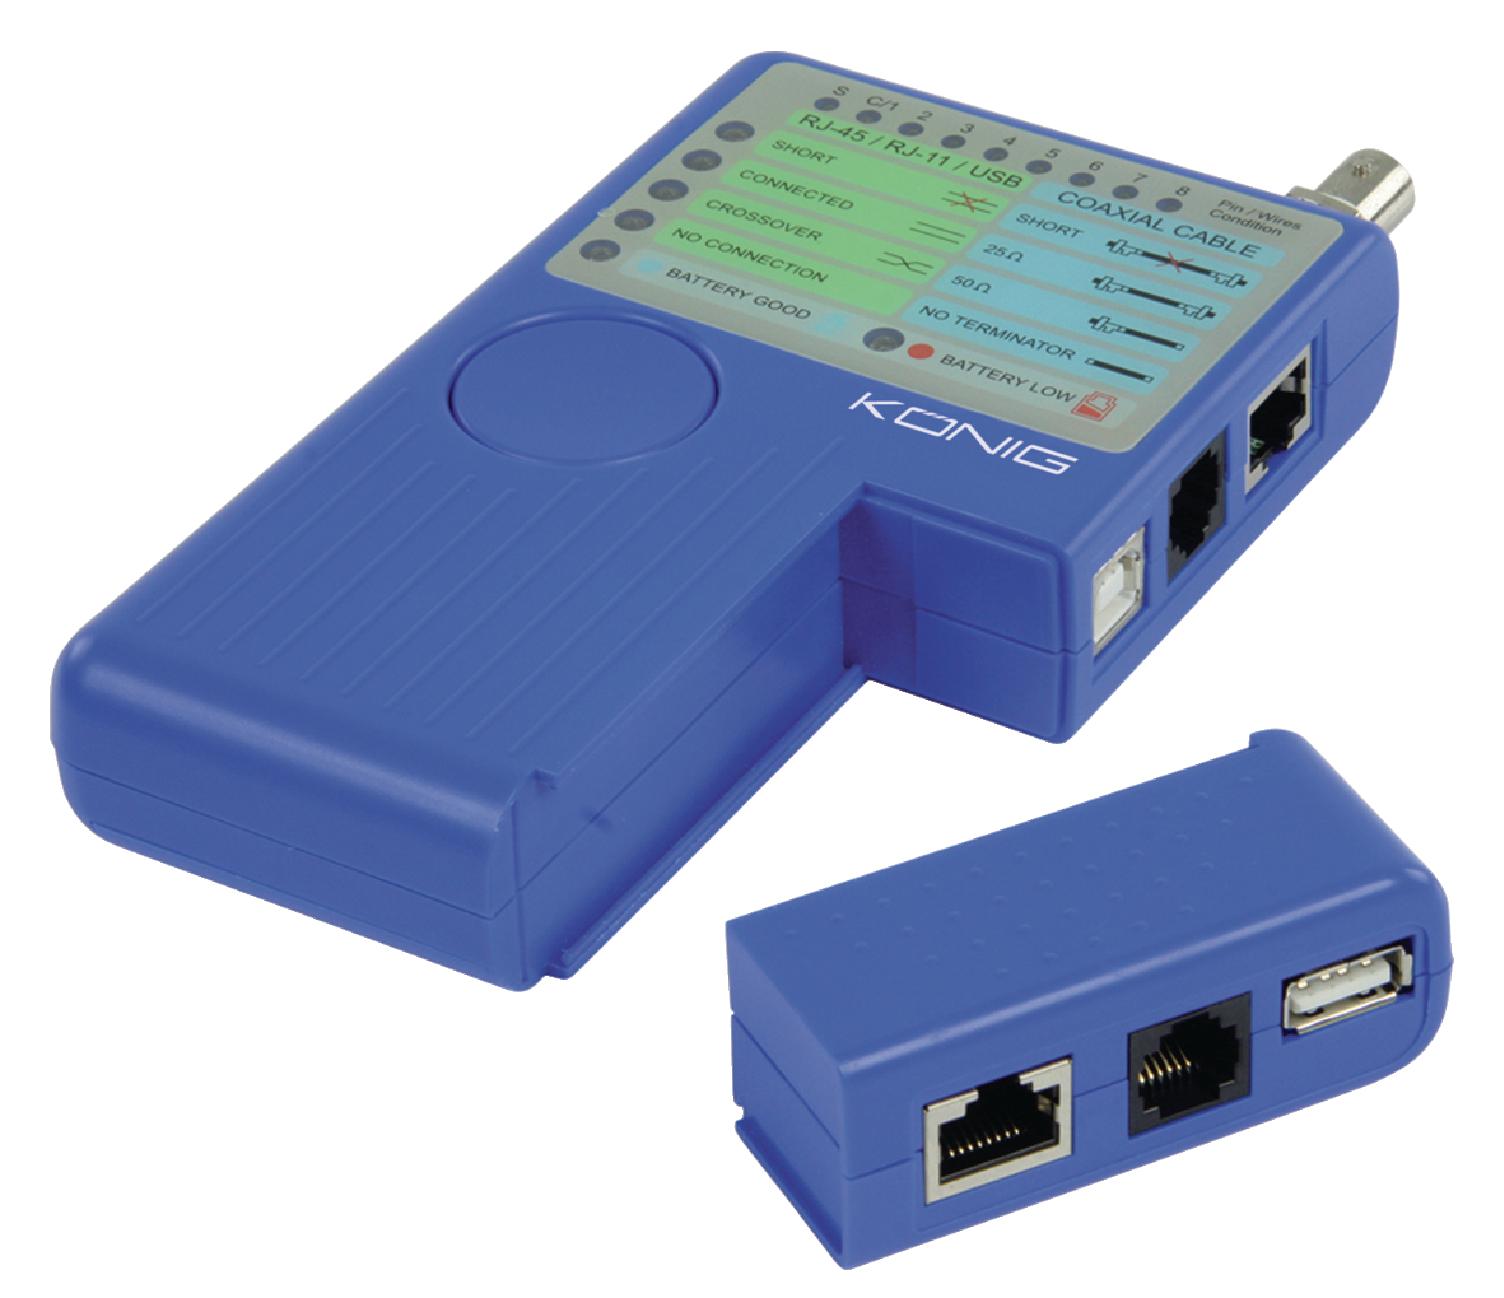 Multifunkční tester kabelů s RJ45, RJ11, USB, BNC König CMP-RCT21